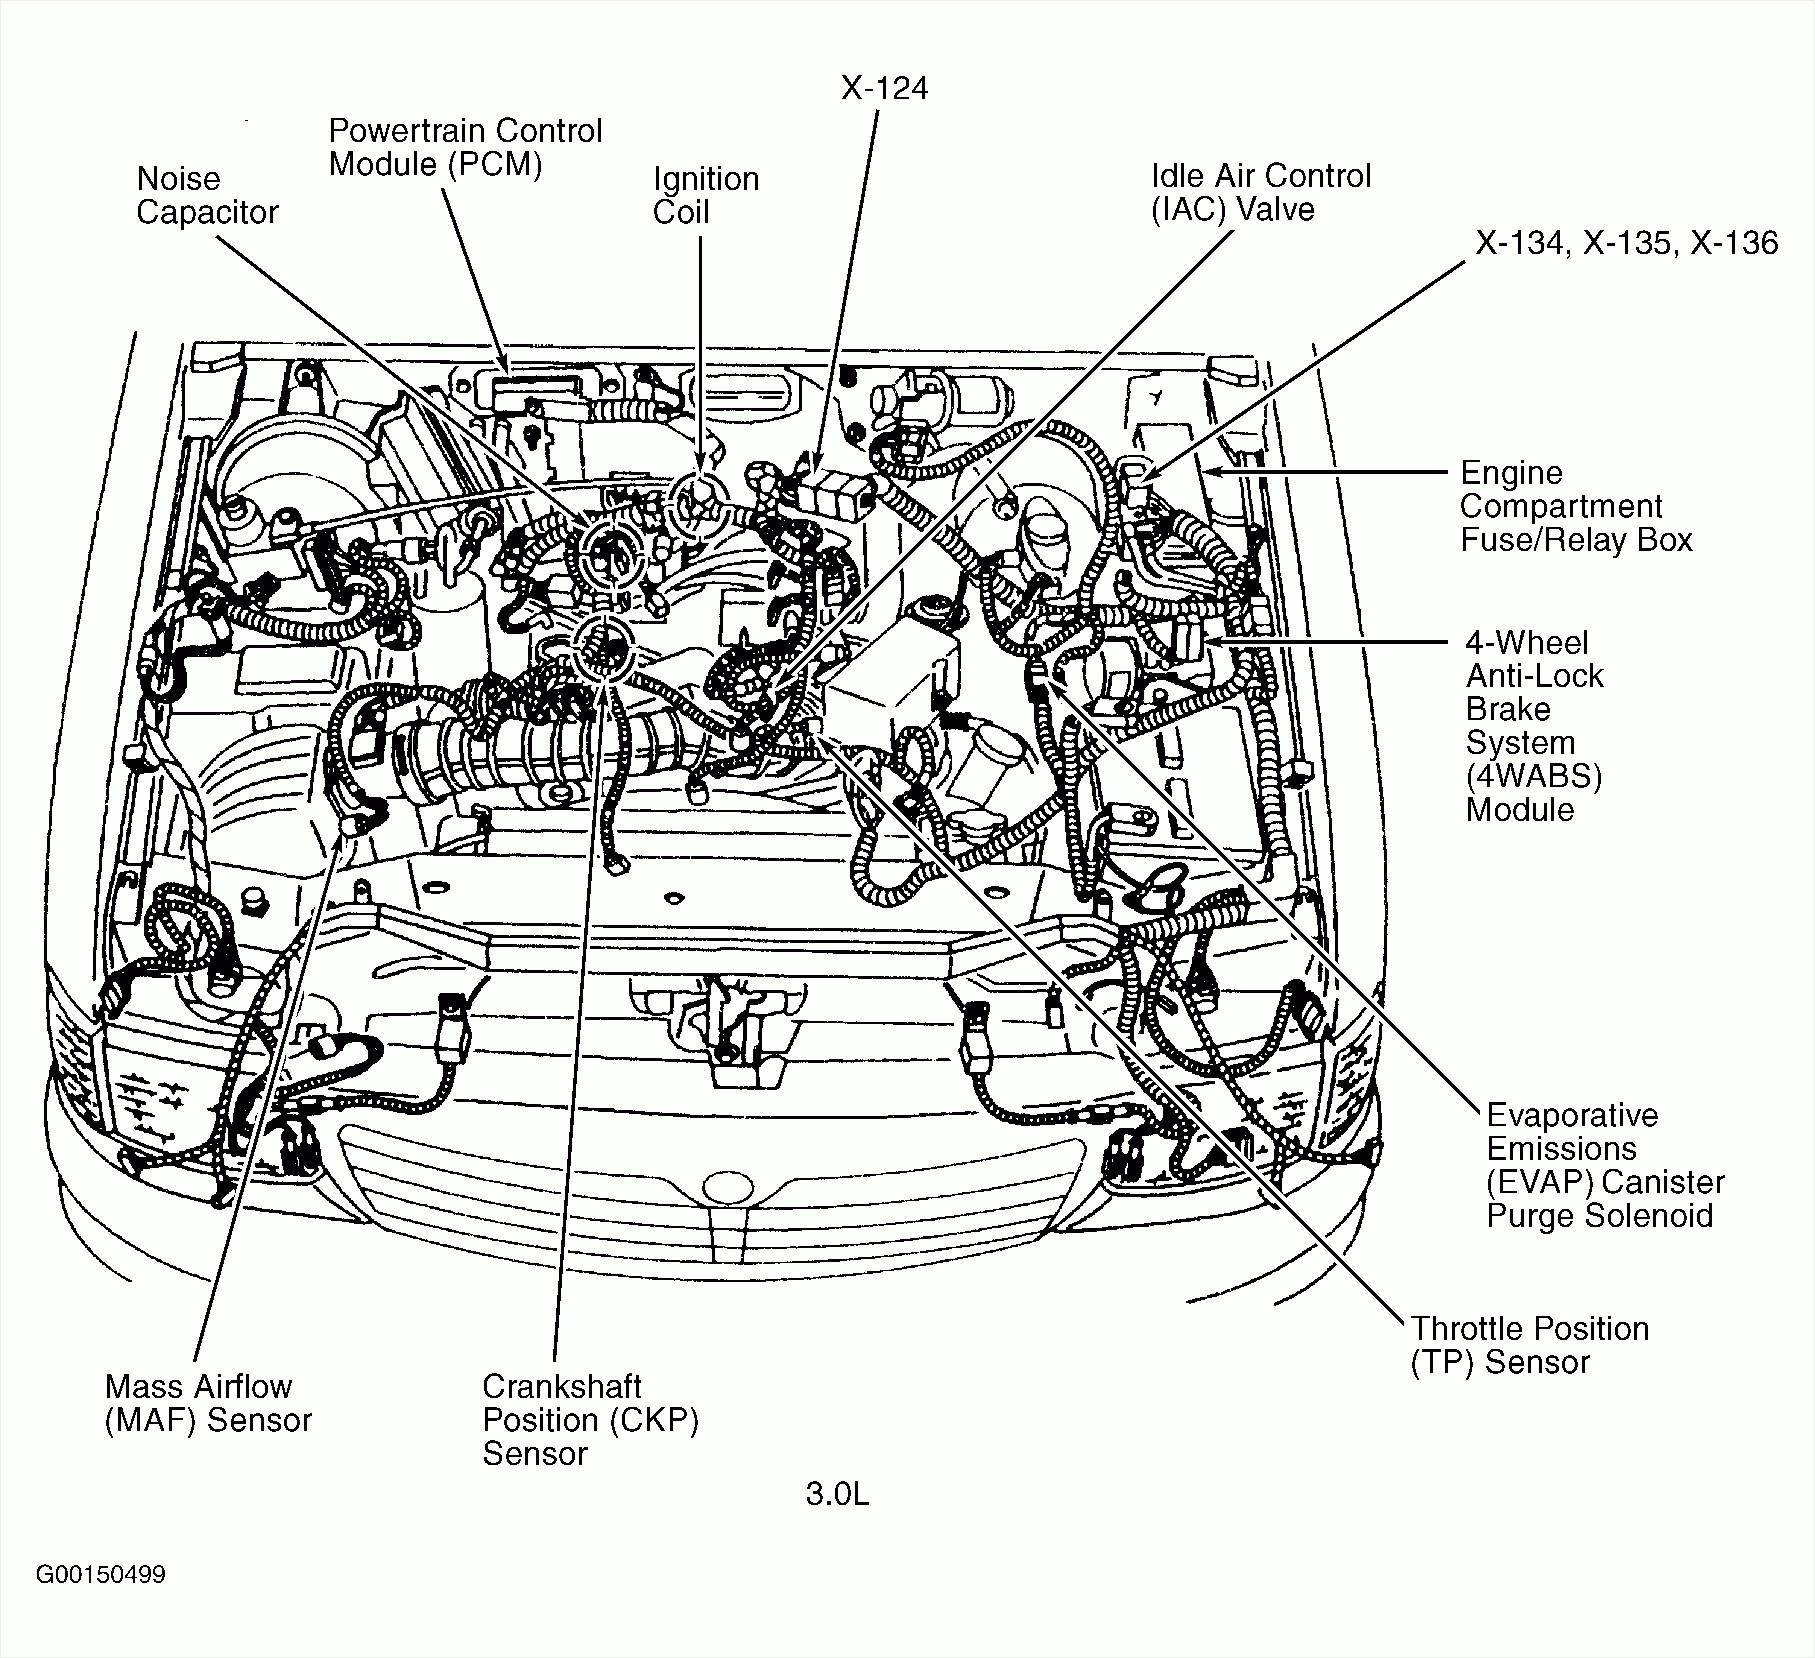 3 8l V6 Engine Diagram - Data Wiring Diagram Update